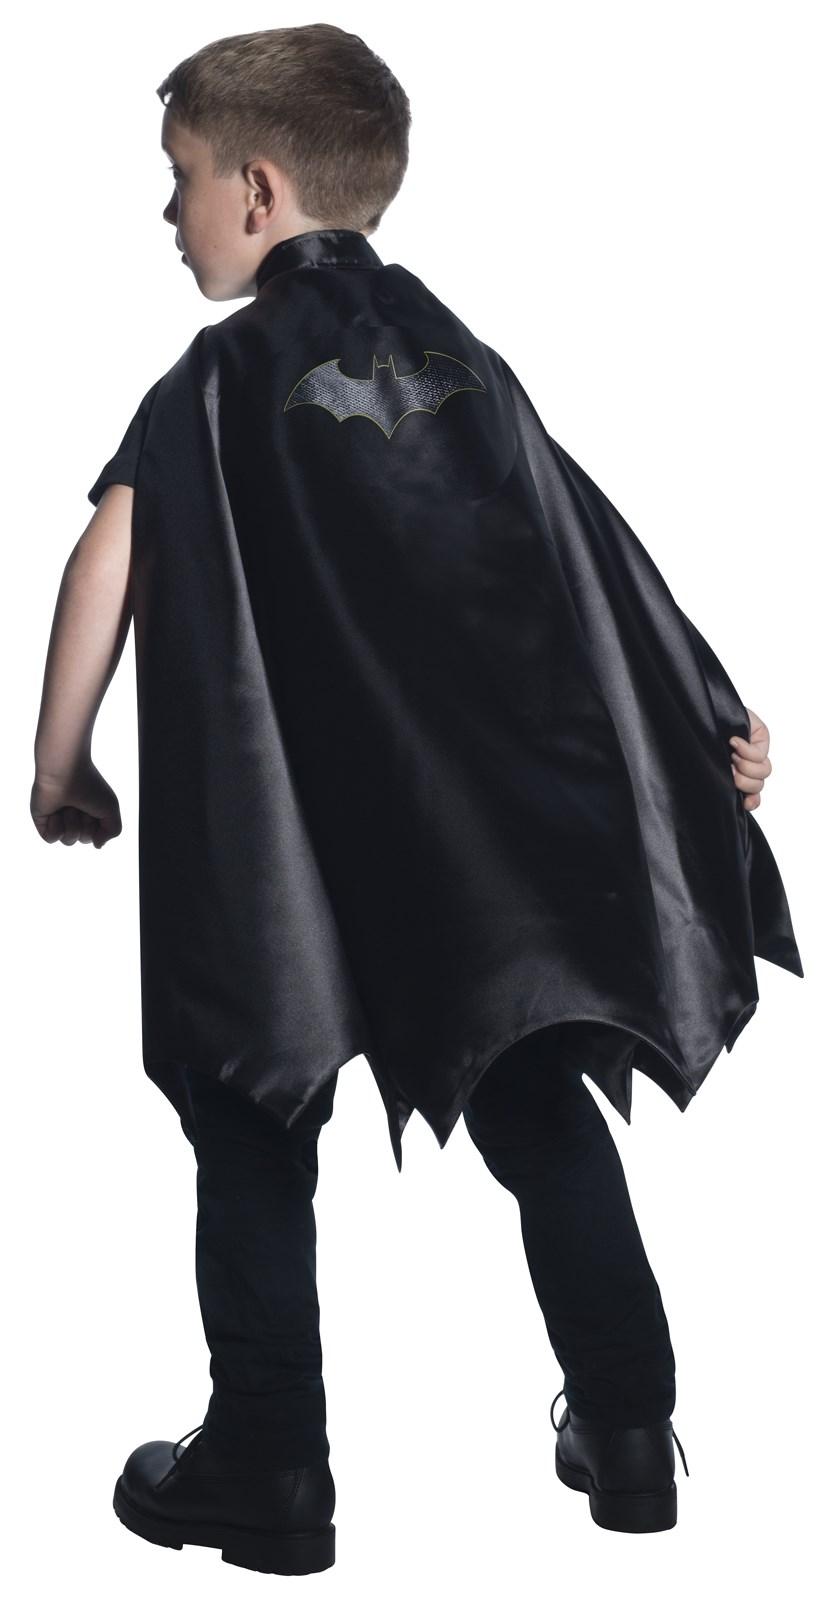 Deluxe Batman Cape For Kids